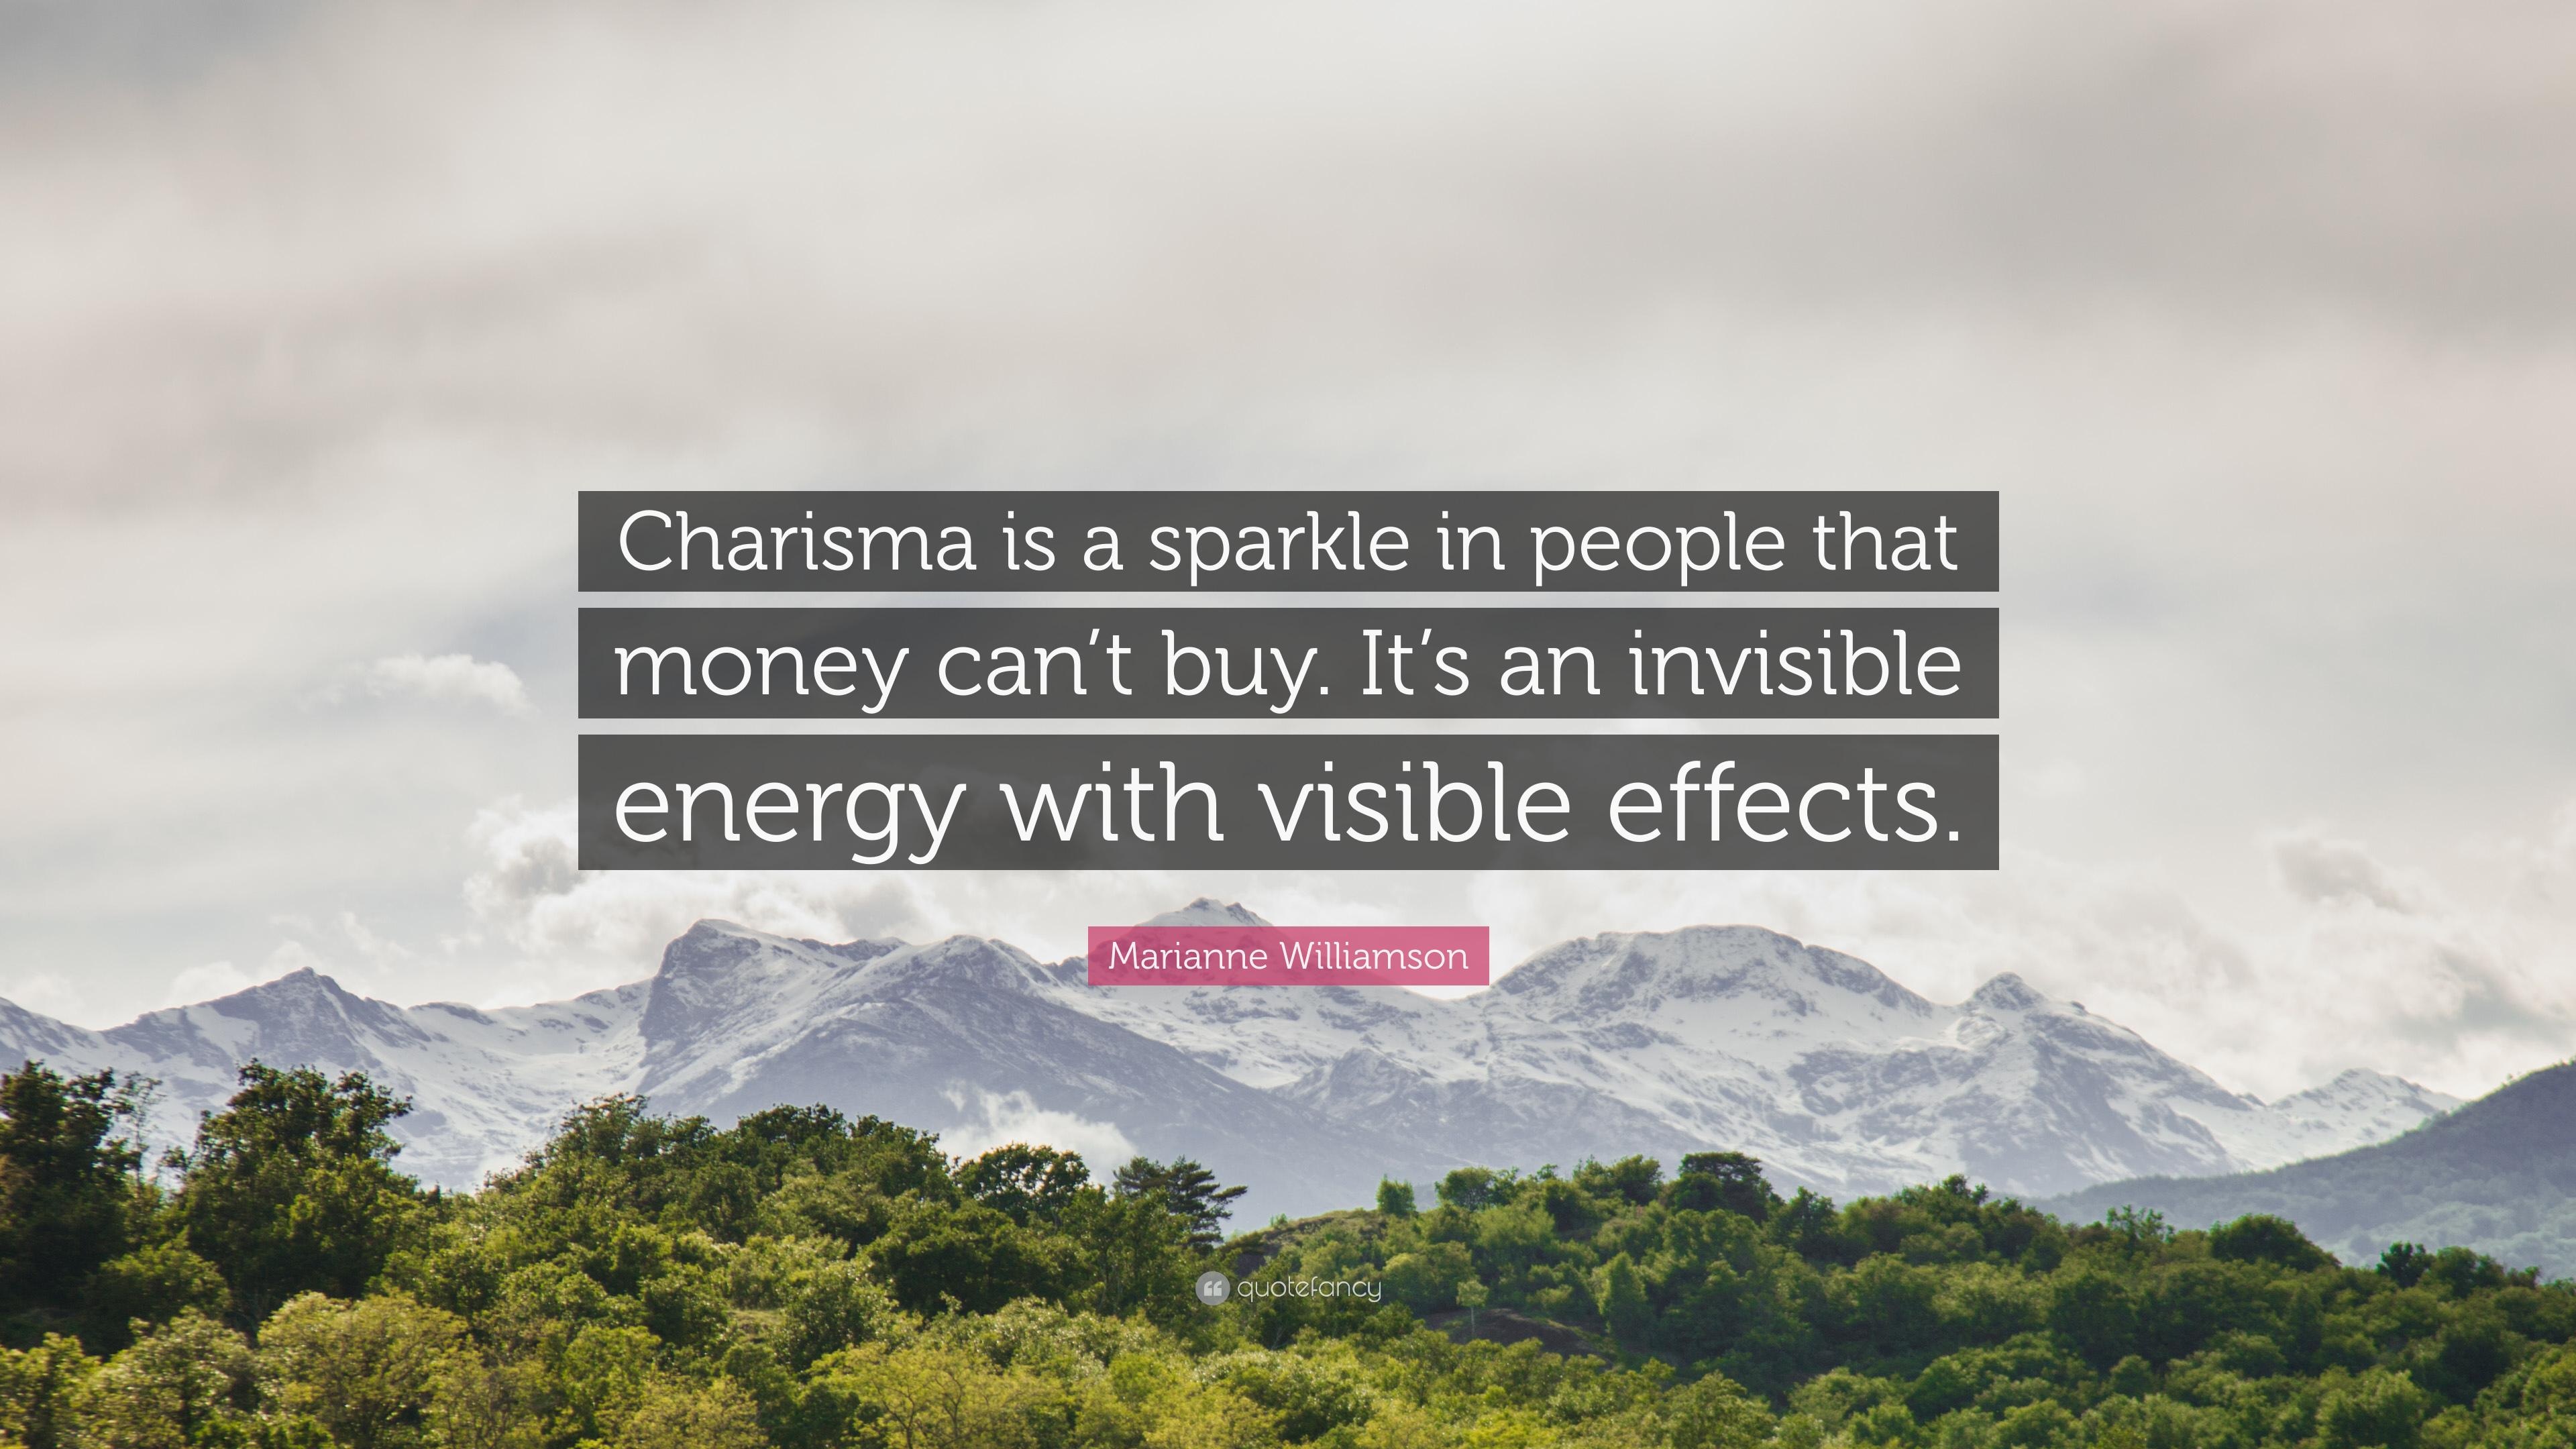 ciel blog - charismatic leadership